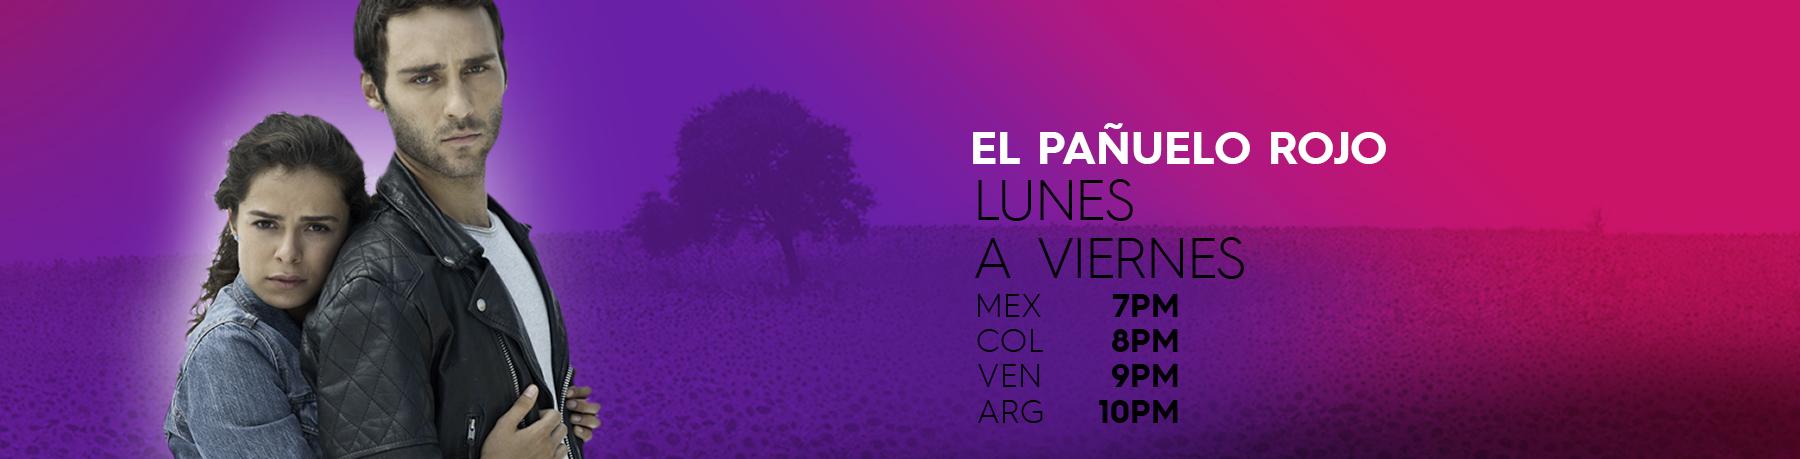 banner_el_panuelo_rojo_latam_1800x459px_hires